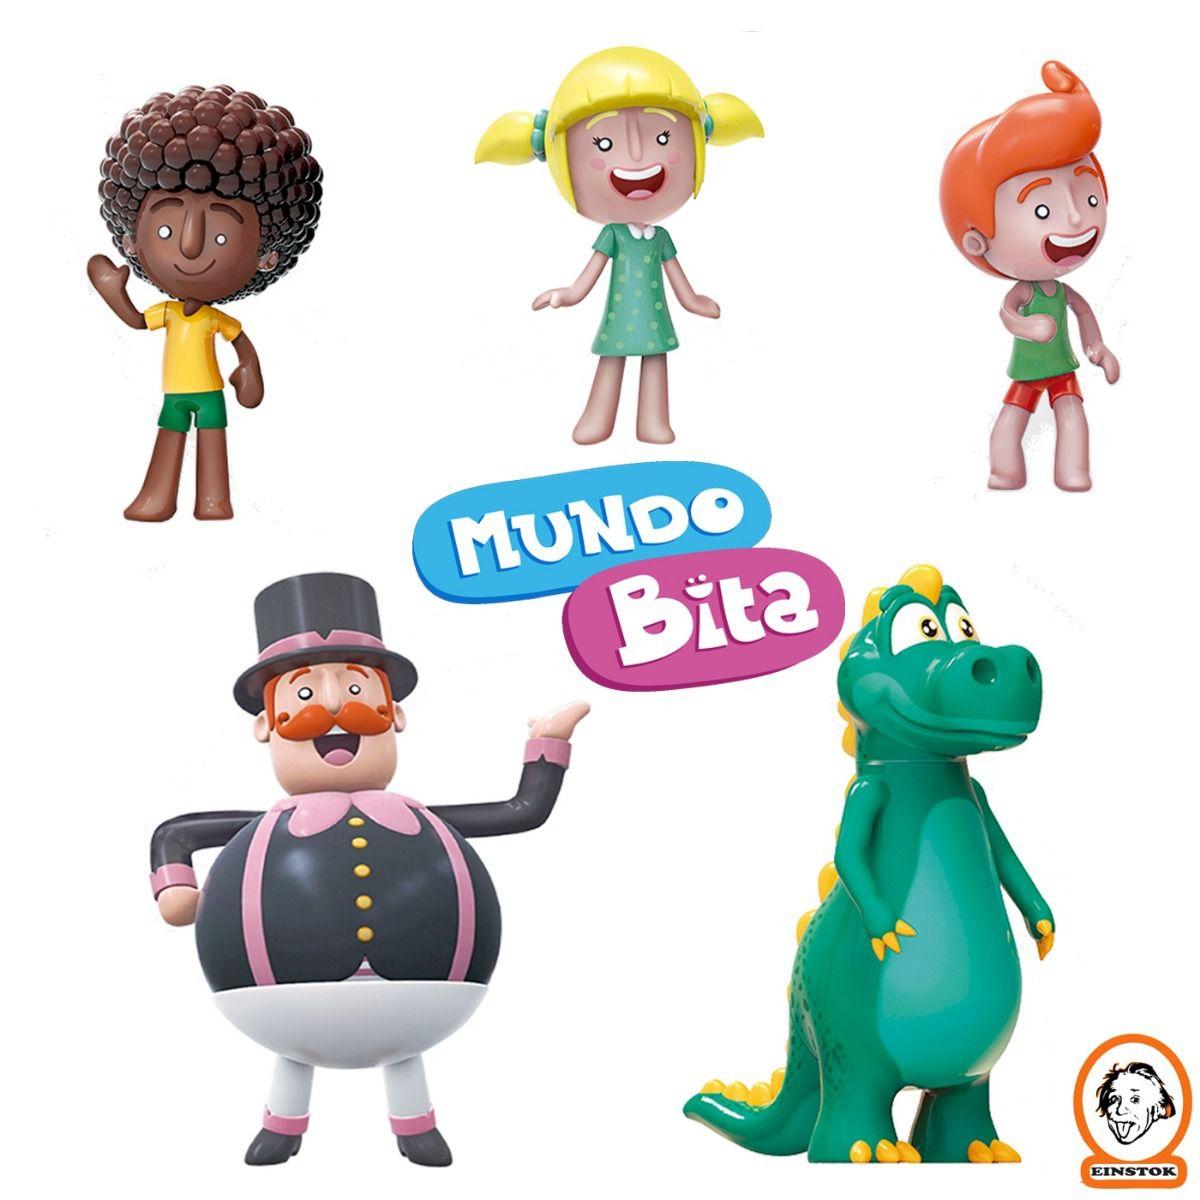 Mundo Bita personagens de Brinquedo - Líder Brinquedos